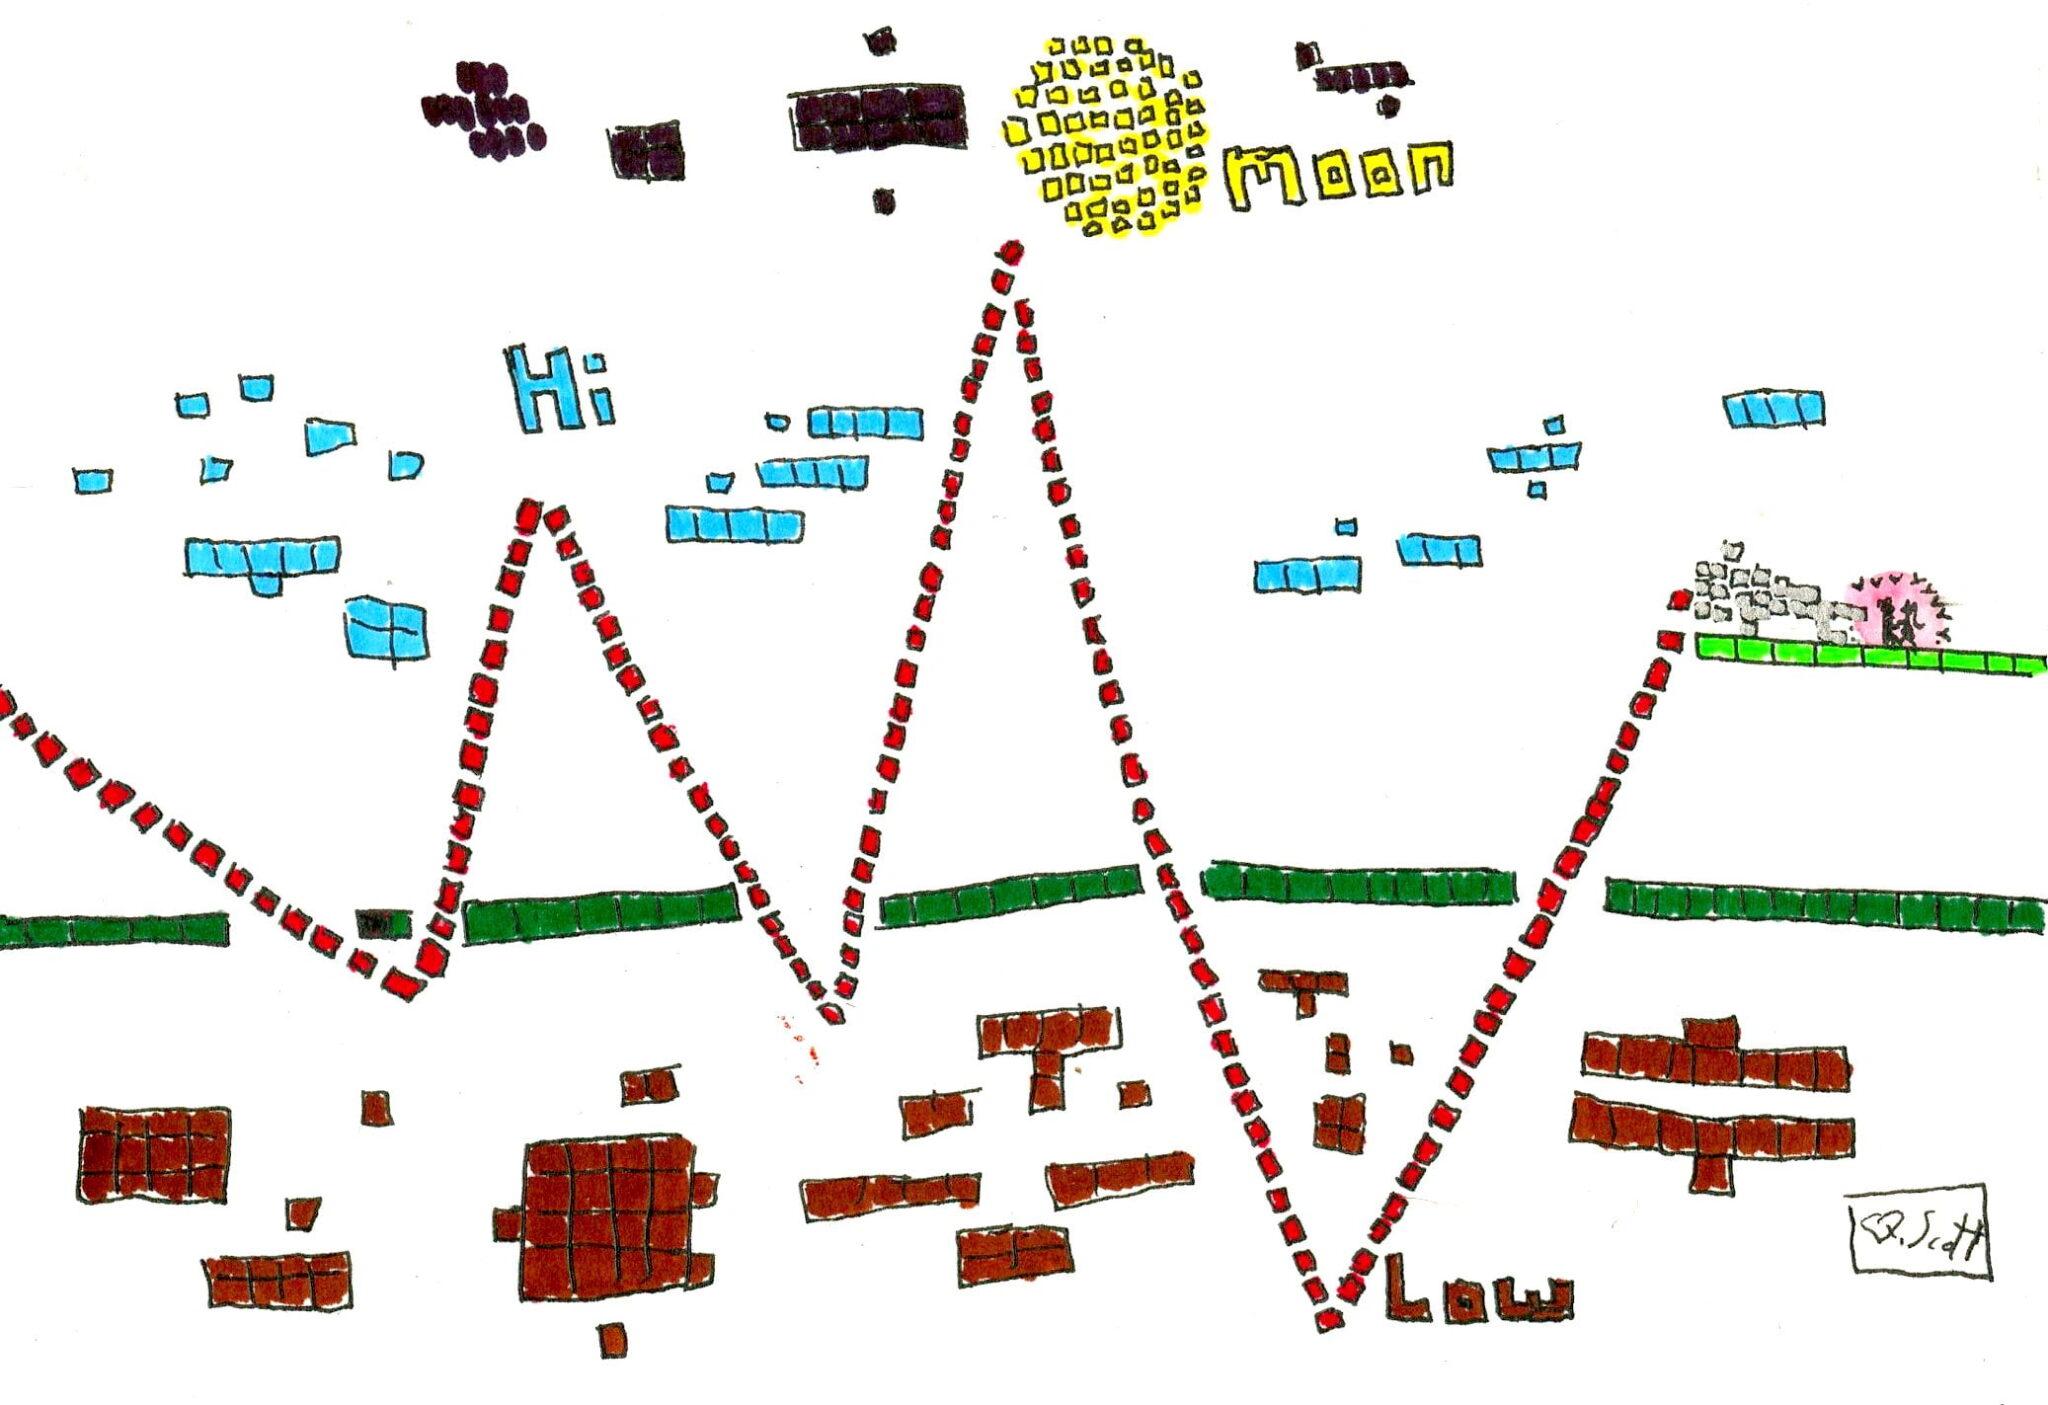 8-bit art